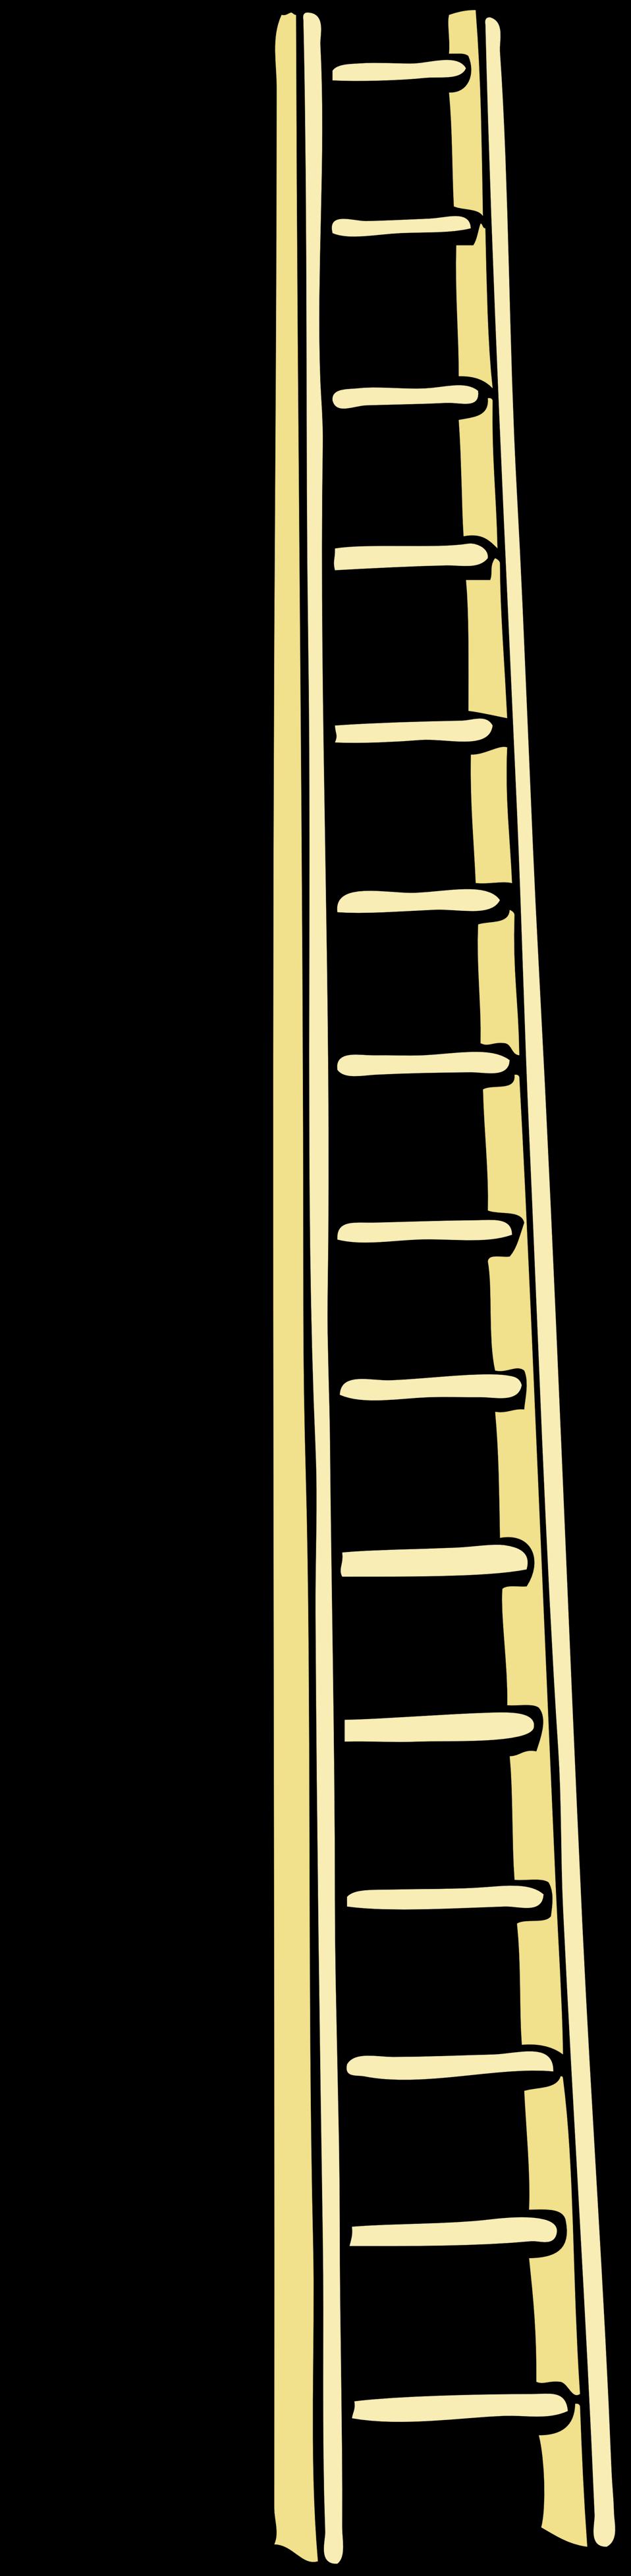 Public domain clip art. Ladder clipart tall ladder